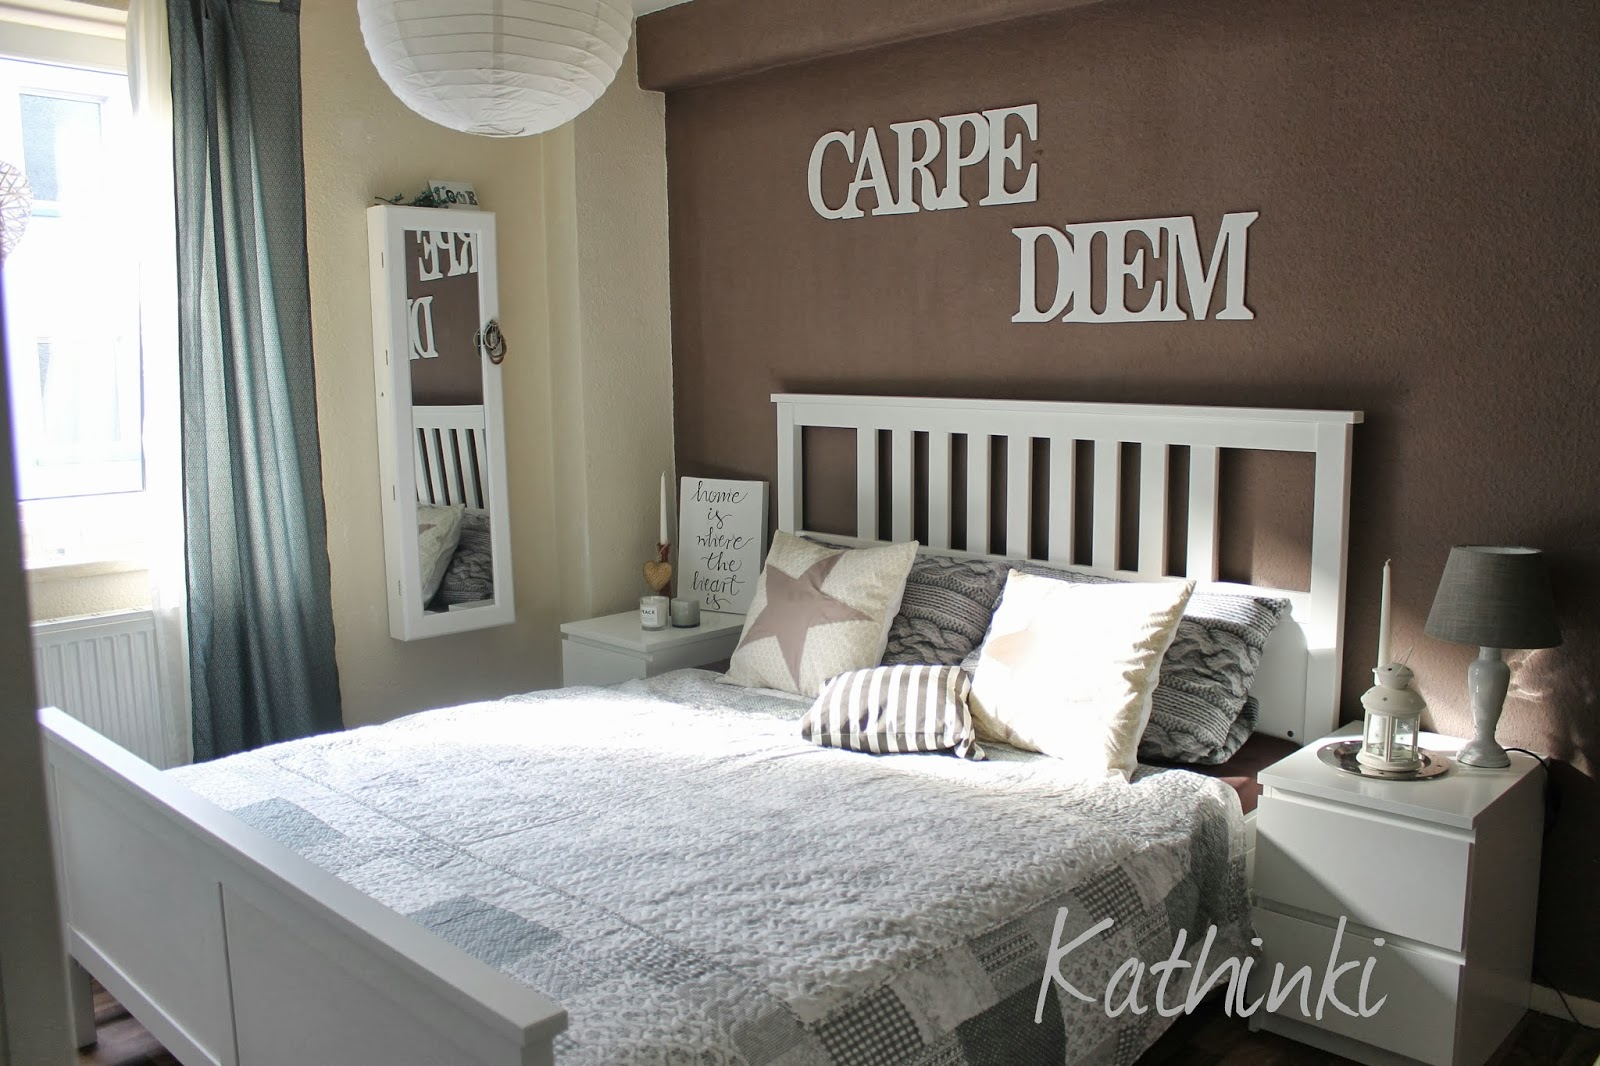 kathinkis dekowelt kuschelzone diy projekt schriftzug carpe diem. Black Bedroom Furniture Sets. Home Design Ideas